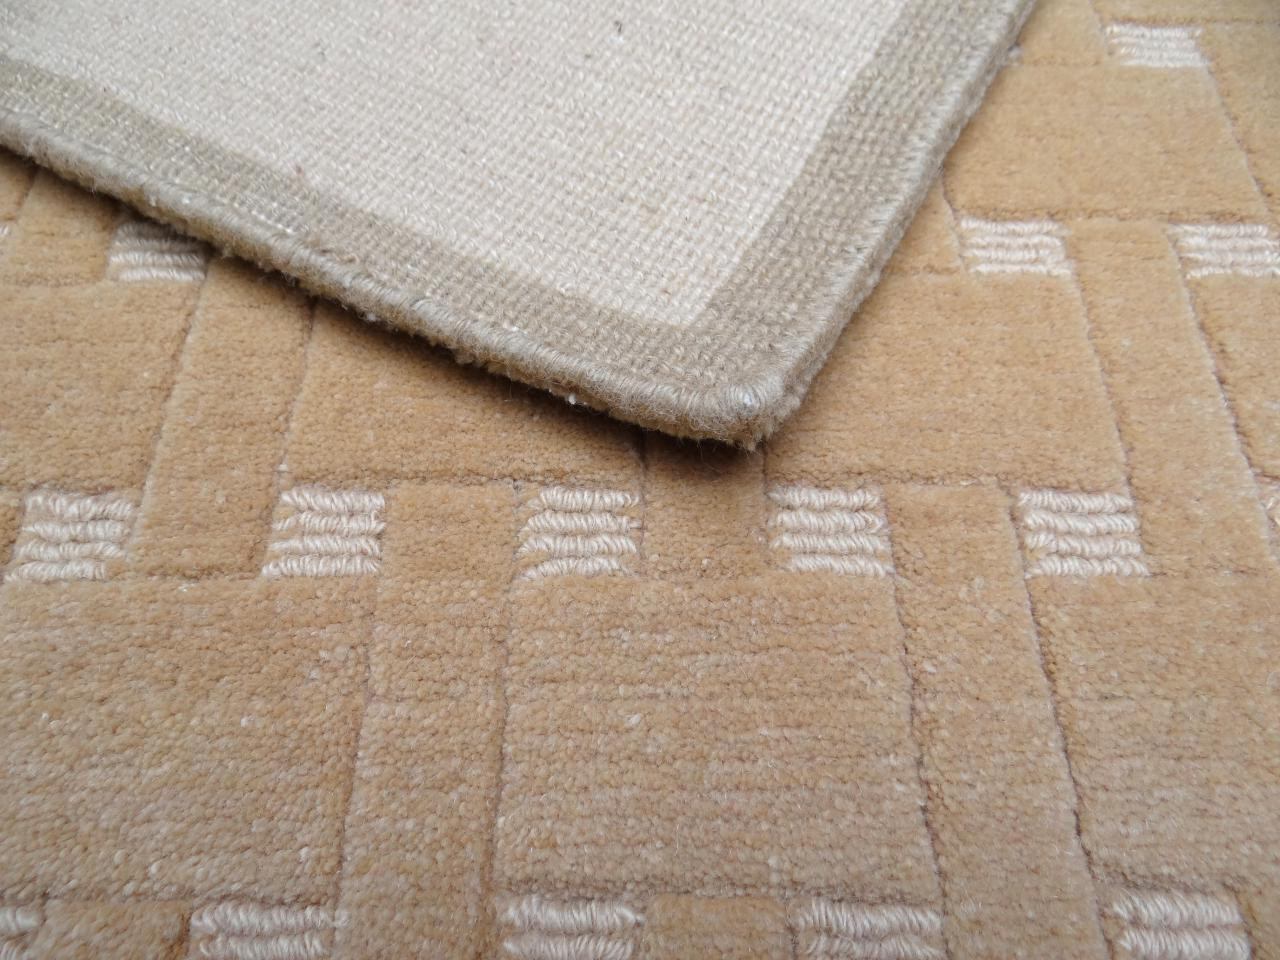 Zen 2 5505 Design Carpets N231 140x70cm